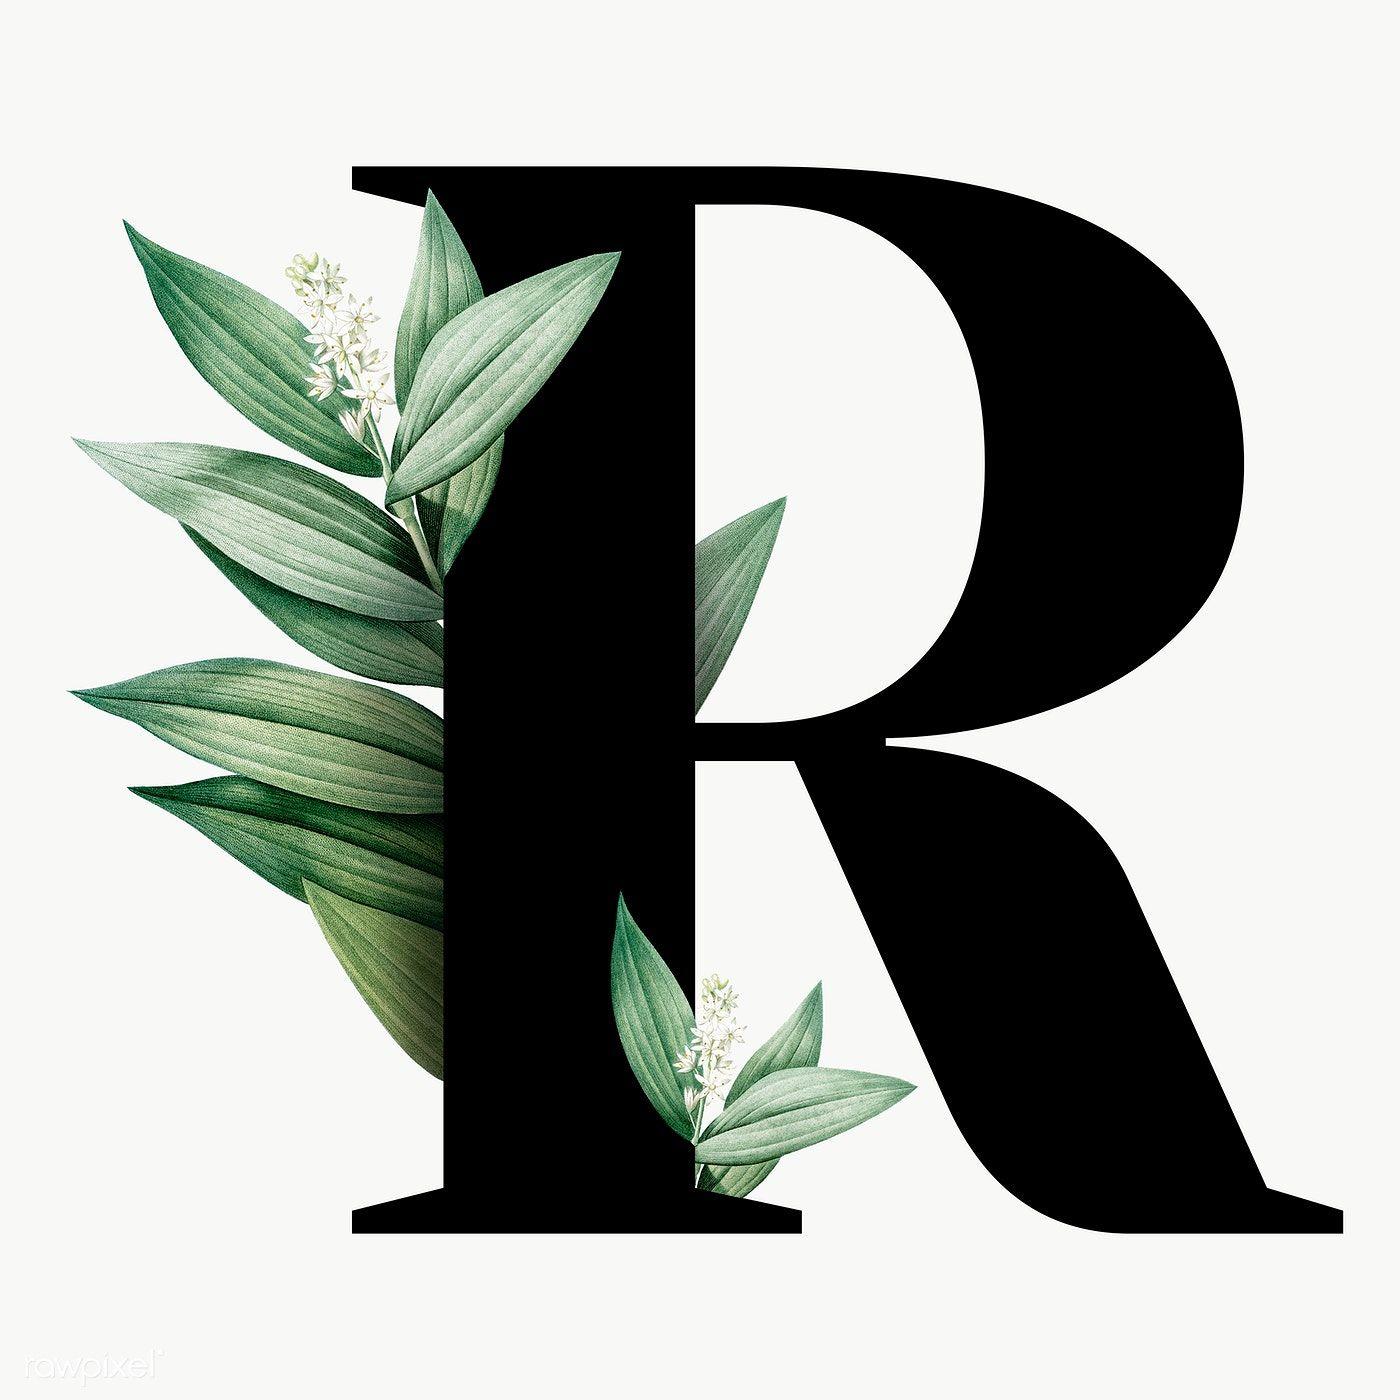 Download Premium Png Of Botanical Capital Letter R Transparent Png 584846 Alphabet Letters Design Lettering Alphabet Fonts Aesthetic Letters